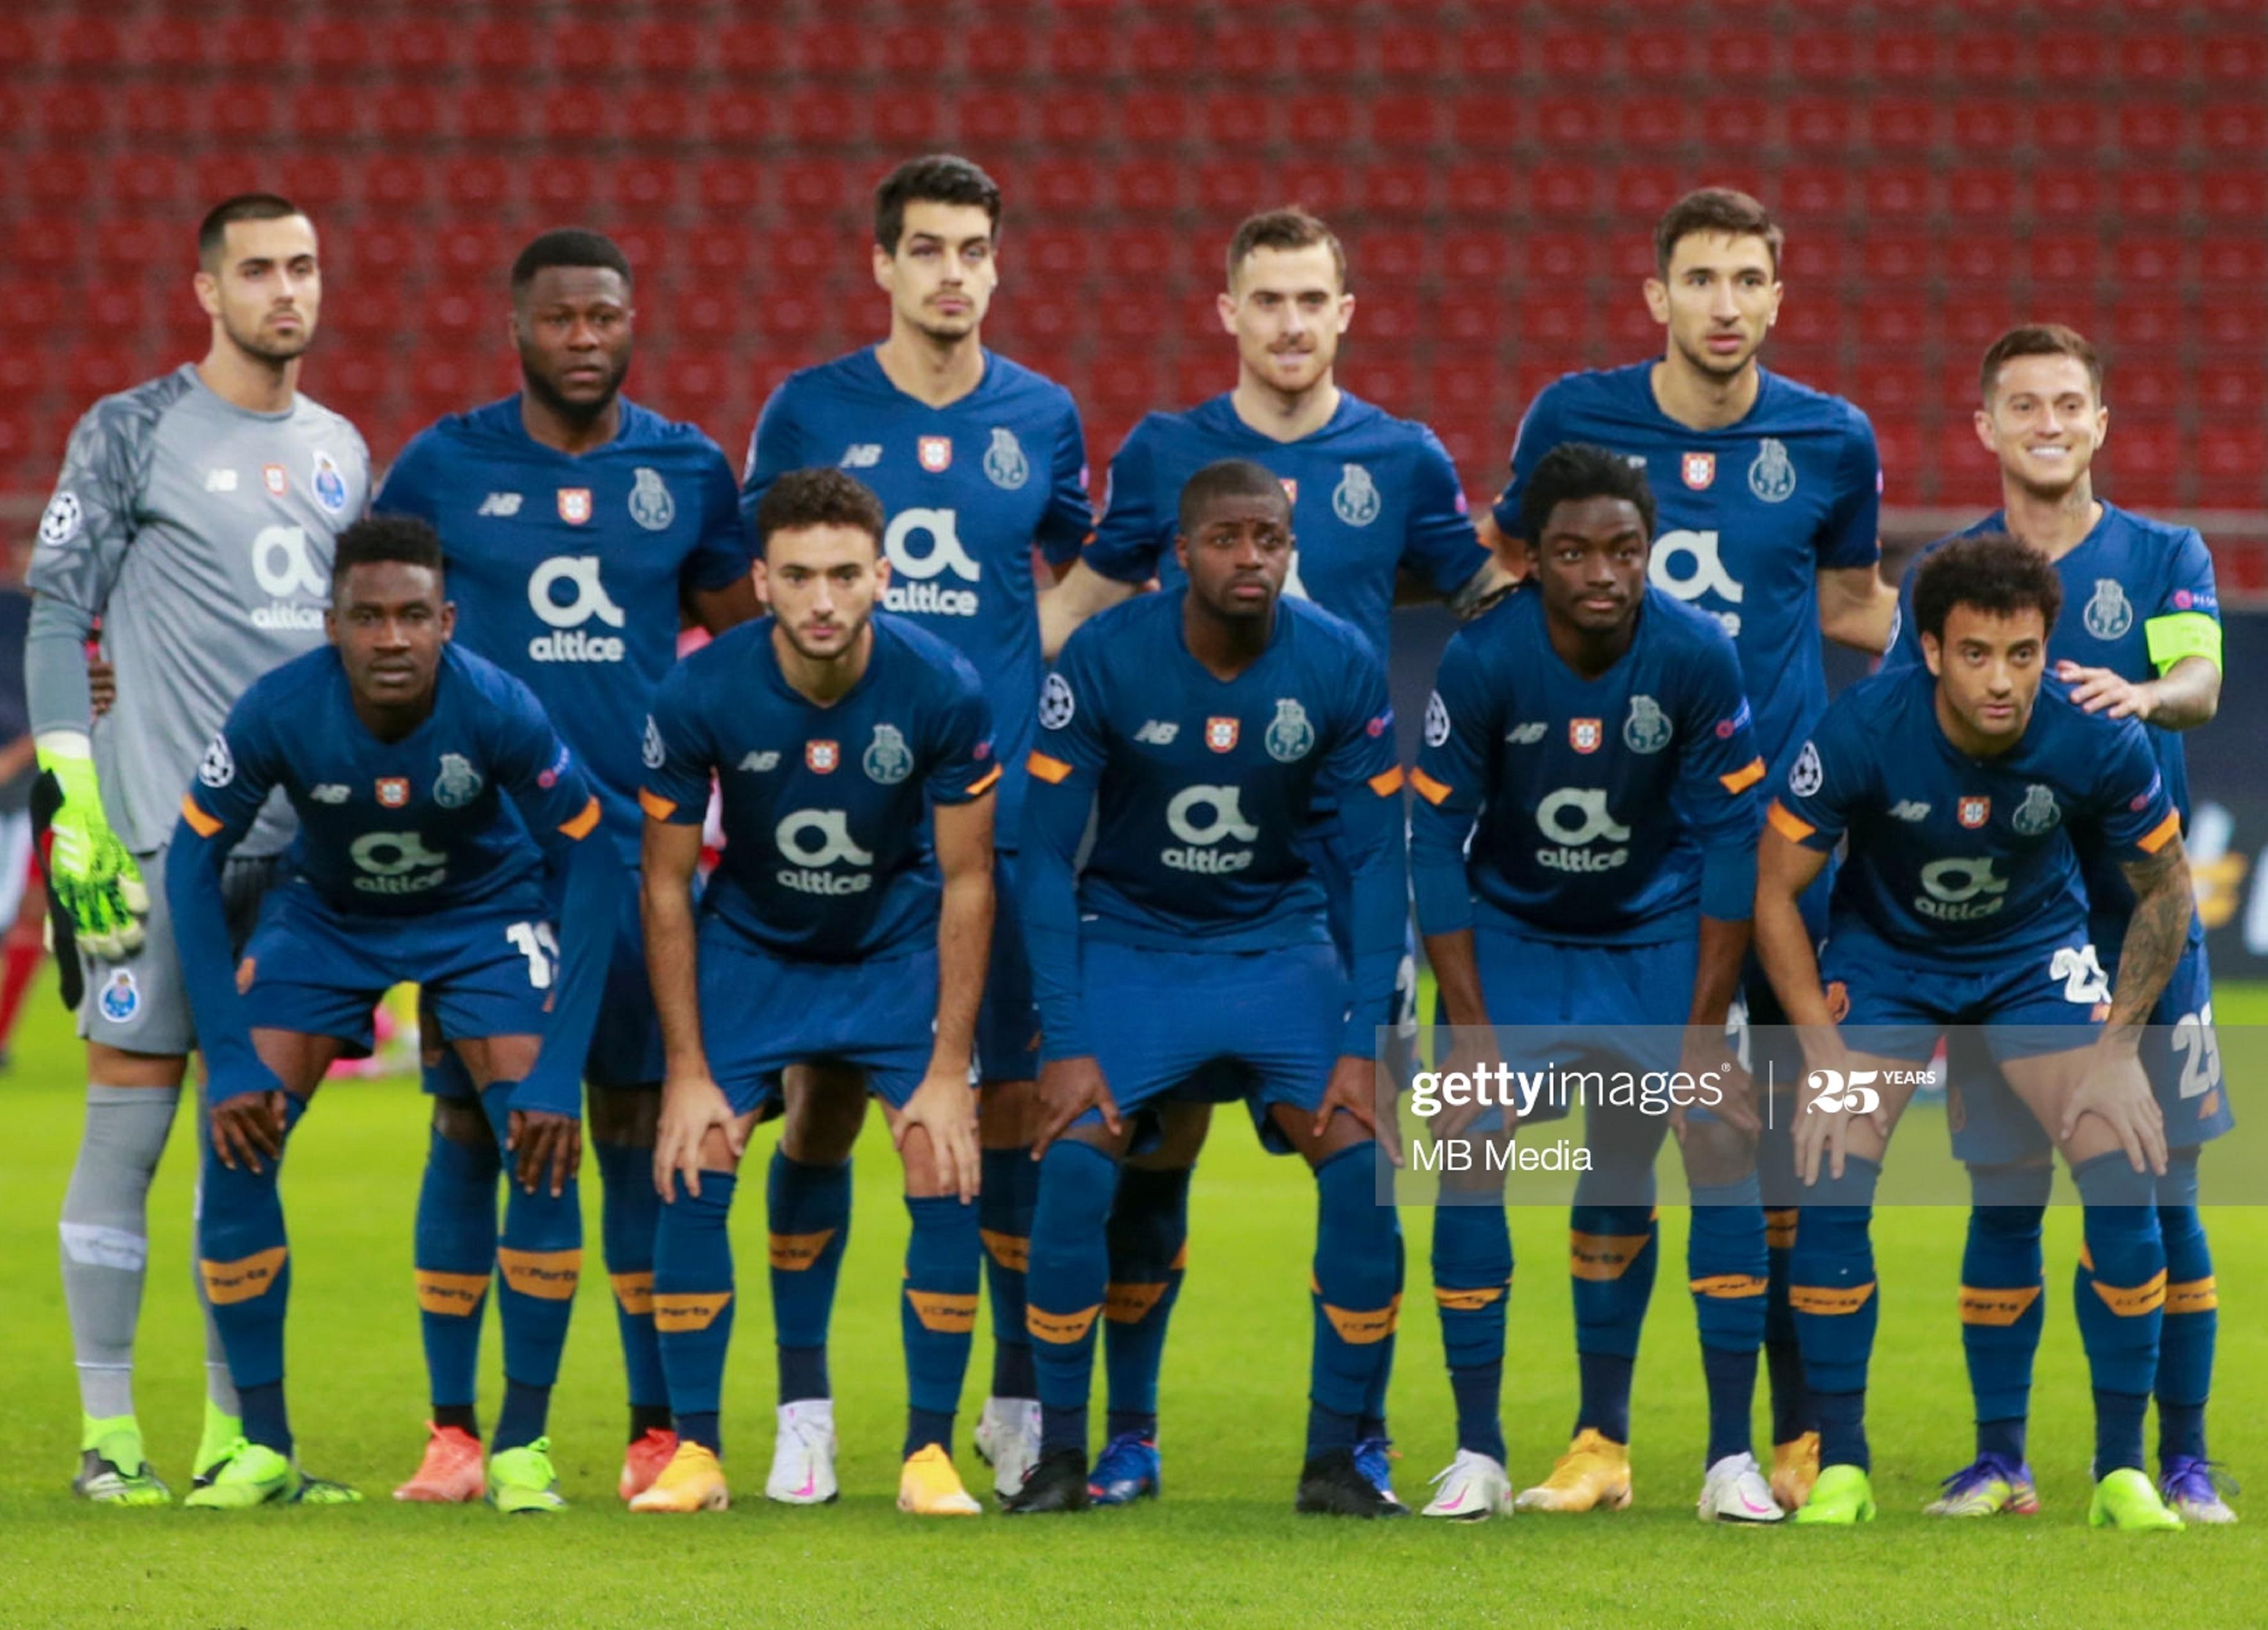 Олимпиакос (Греция) - Порту (Португалия) 0:2